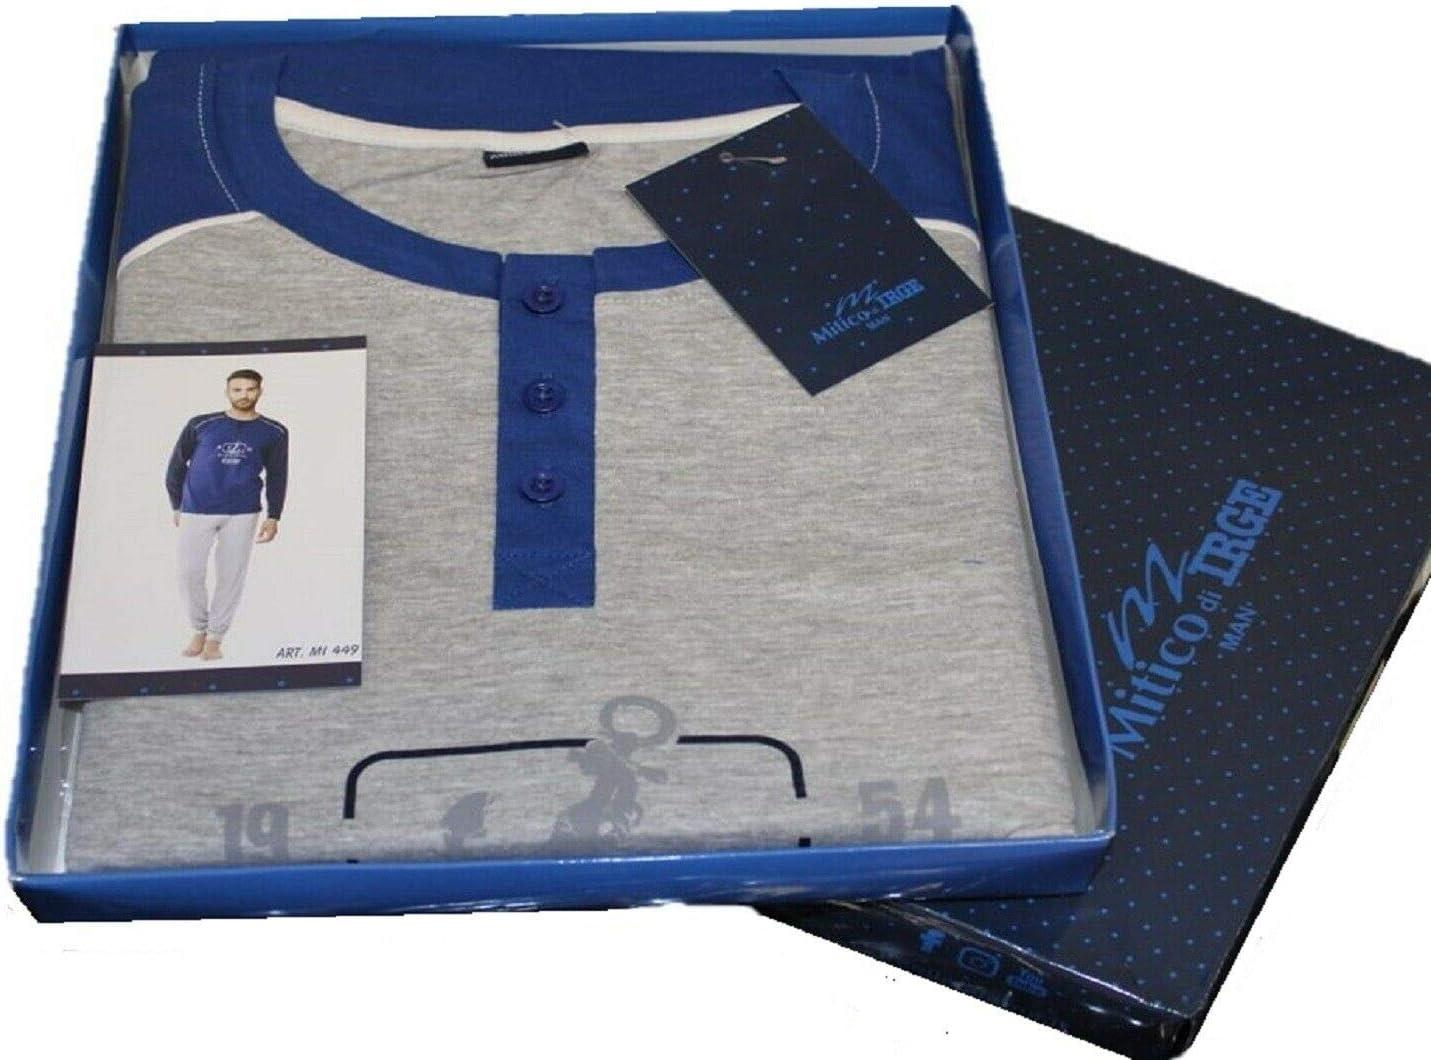 Blu//Gray melange, XL XXL Pigiama Uomo Cotone 100/% IRGE MI449 Manica Lunga e Pantalone Lungo XL L Misure: M